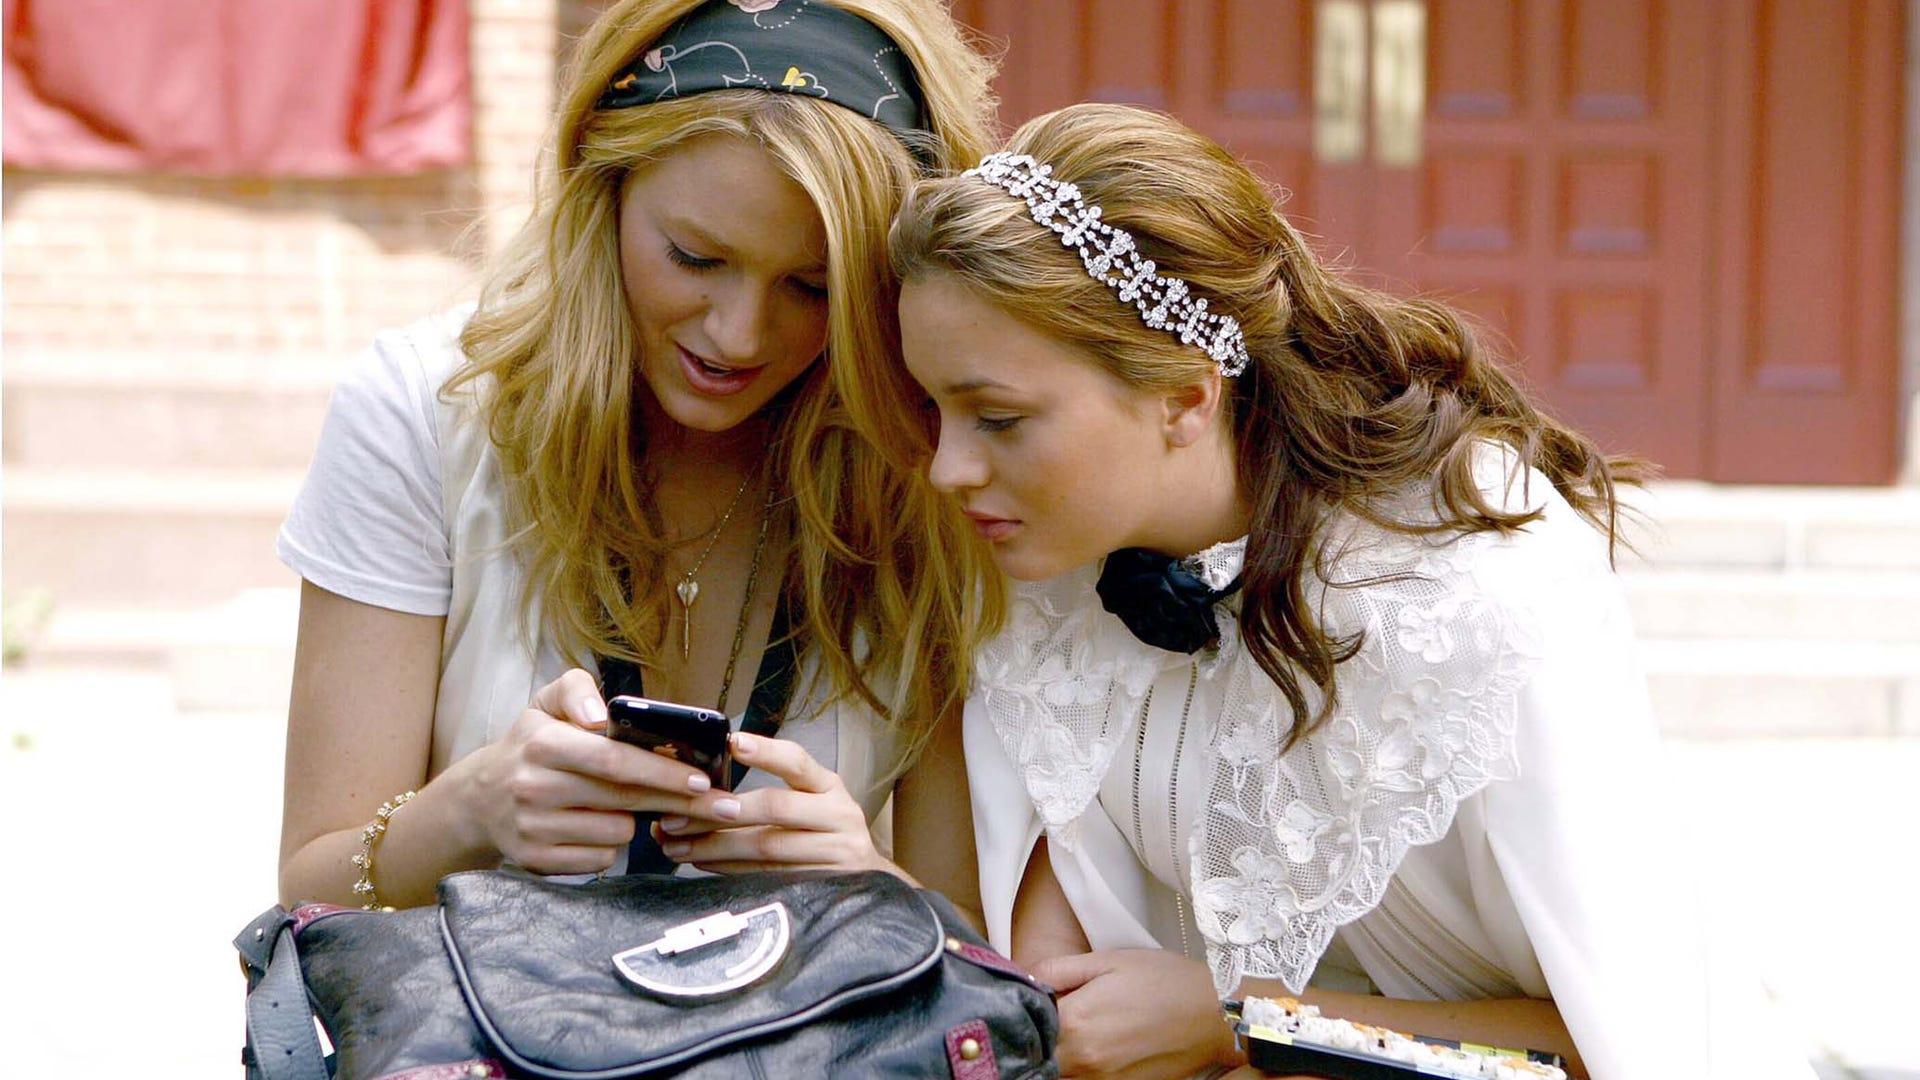 Blake Lively and Leighton Meester, Gossip Girl